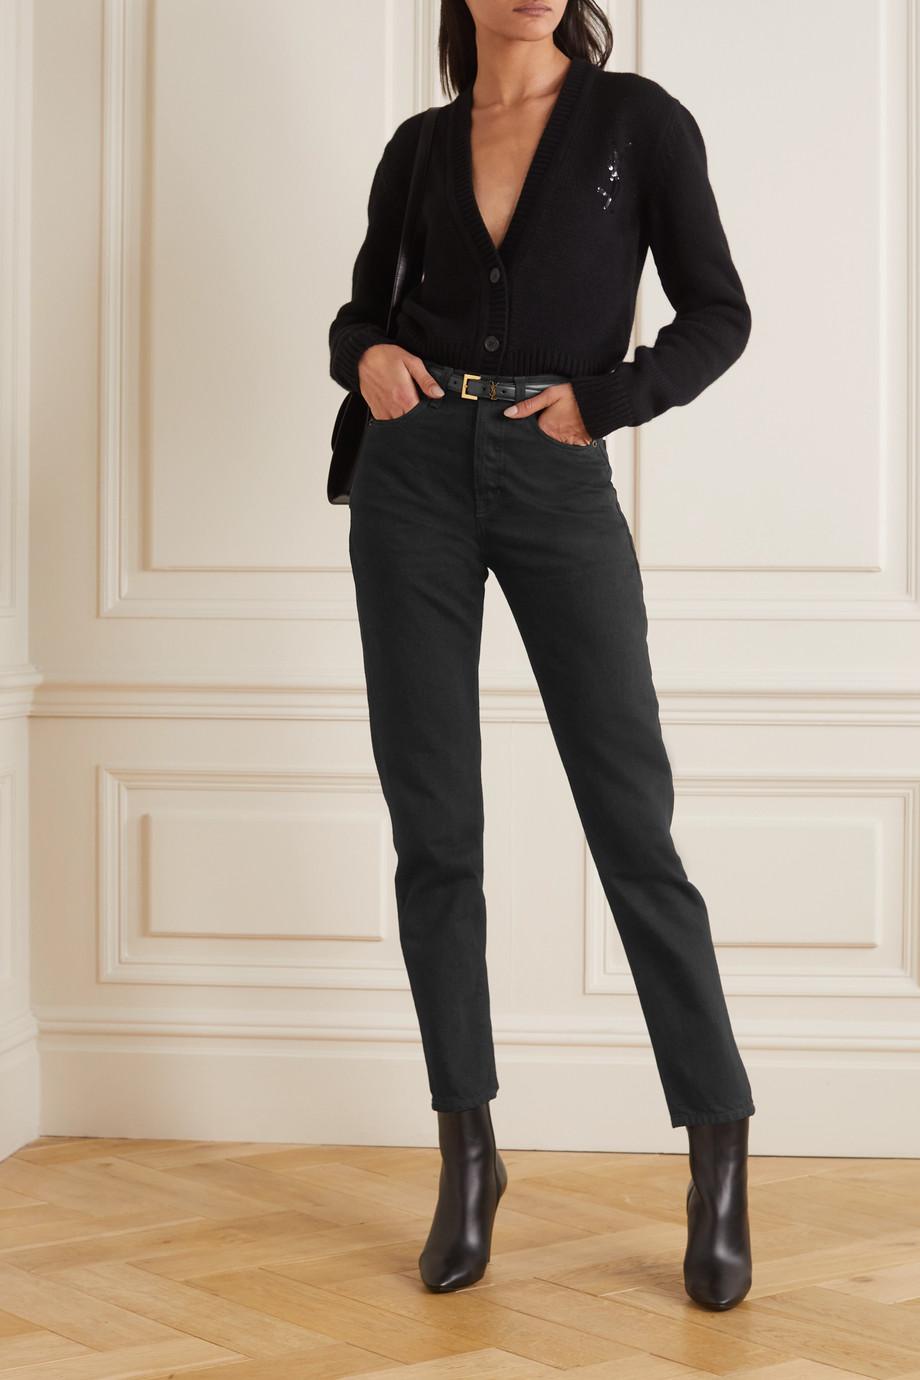 SAINT LAURENT Jean slim taille haute